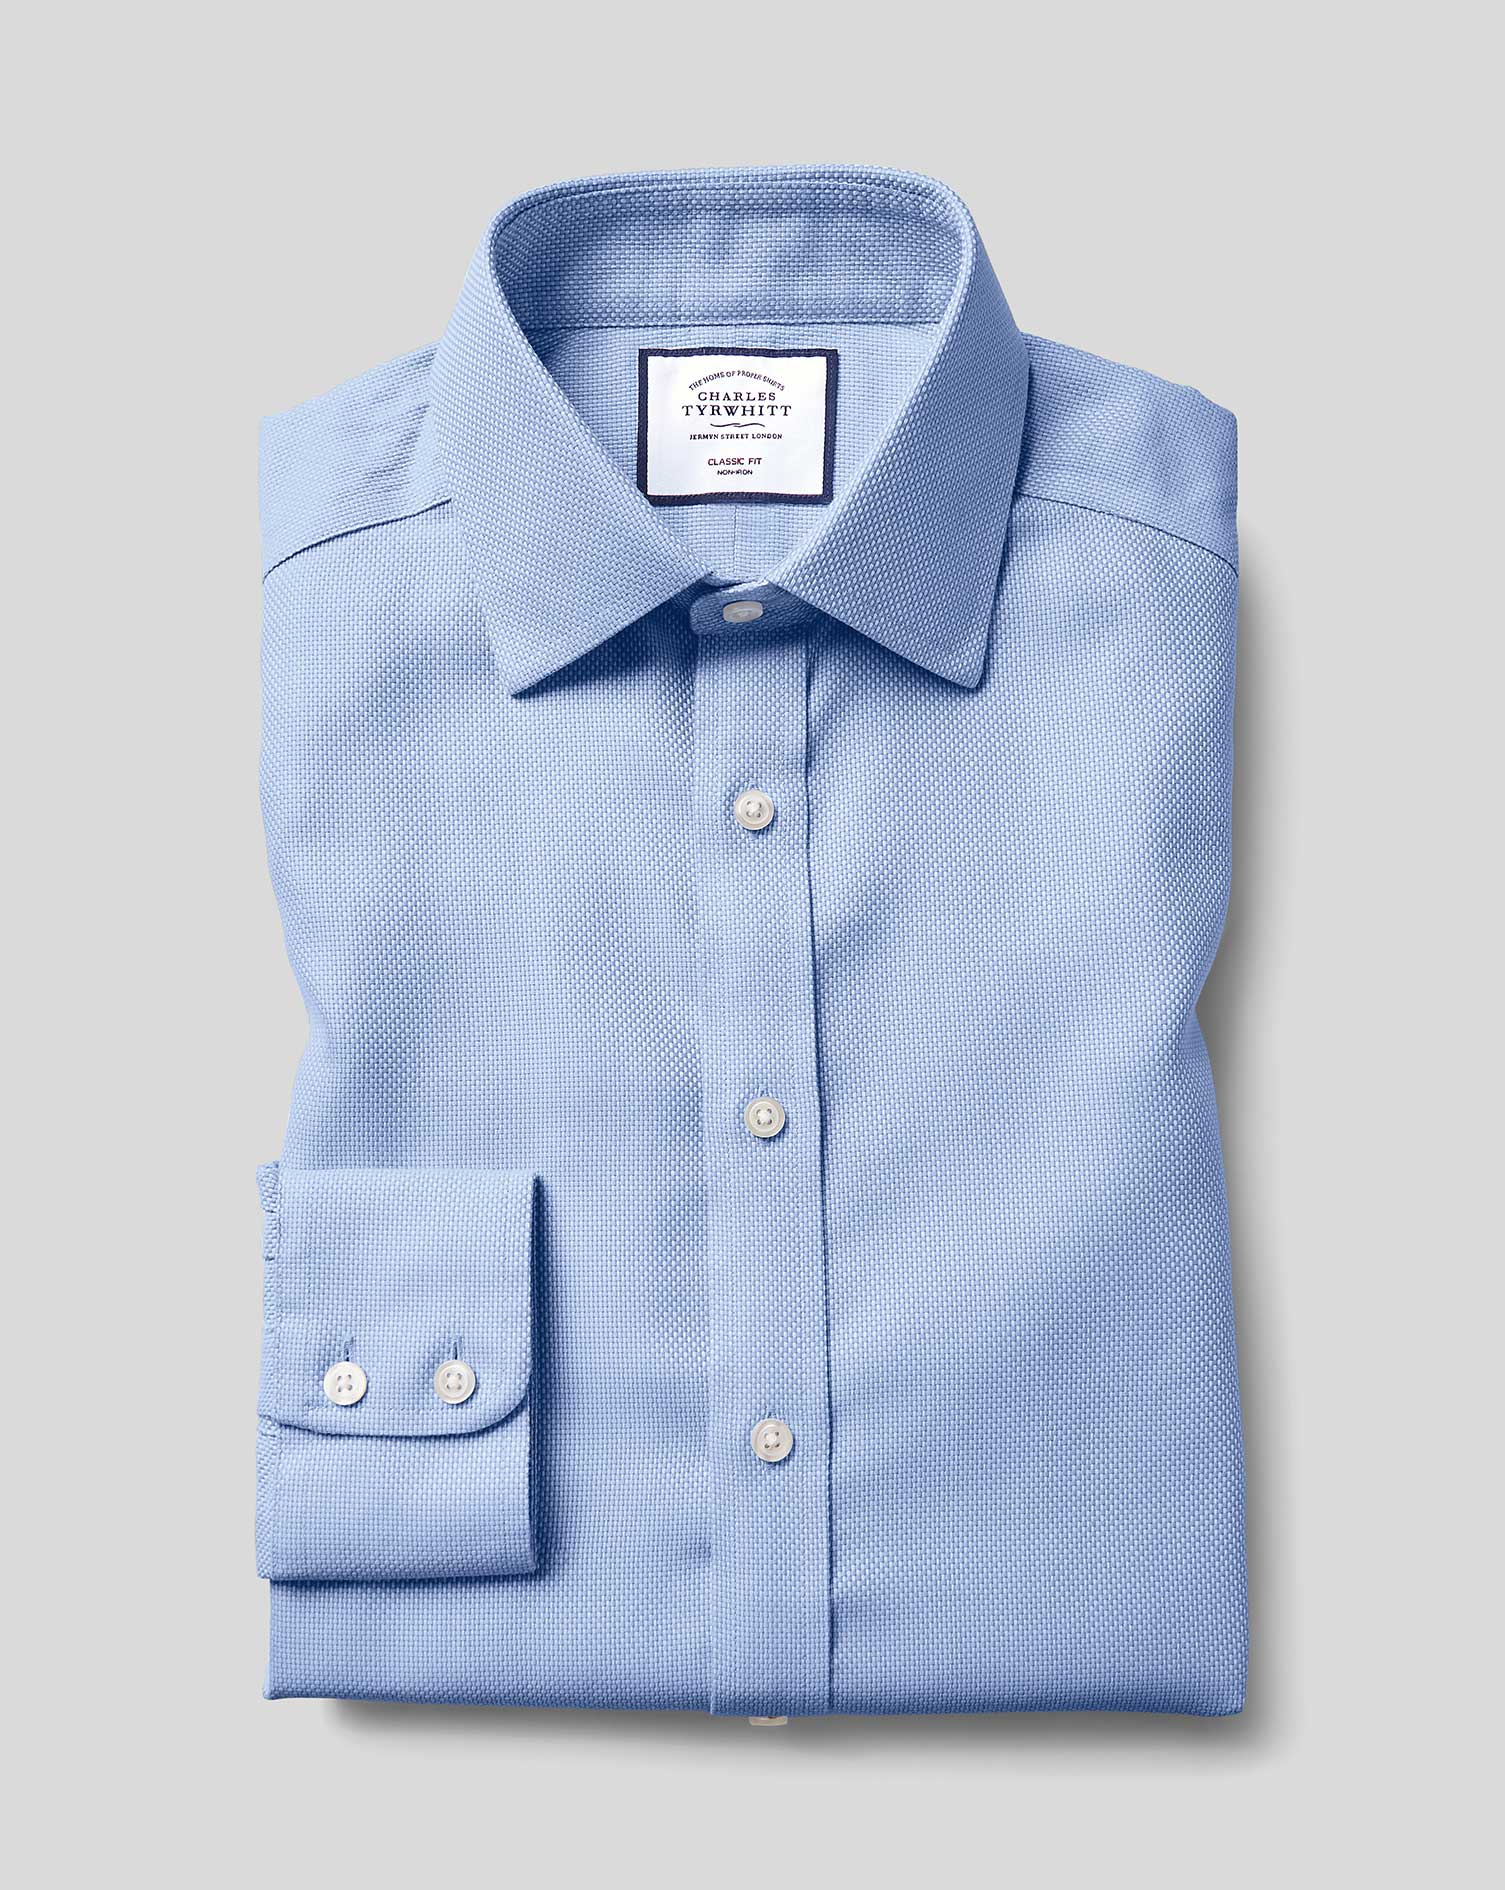 Cotton Classic Fit Non-Iron Buckingham Weave Blue Shirt